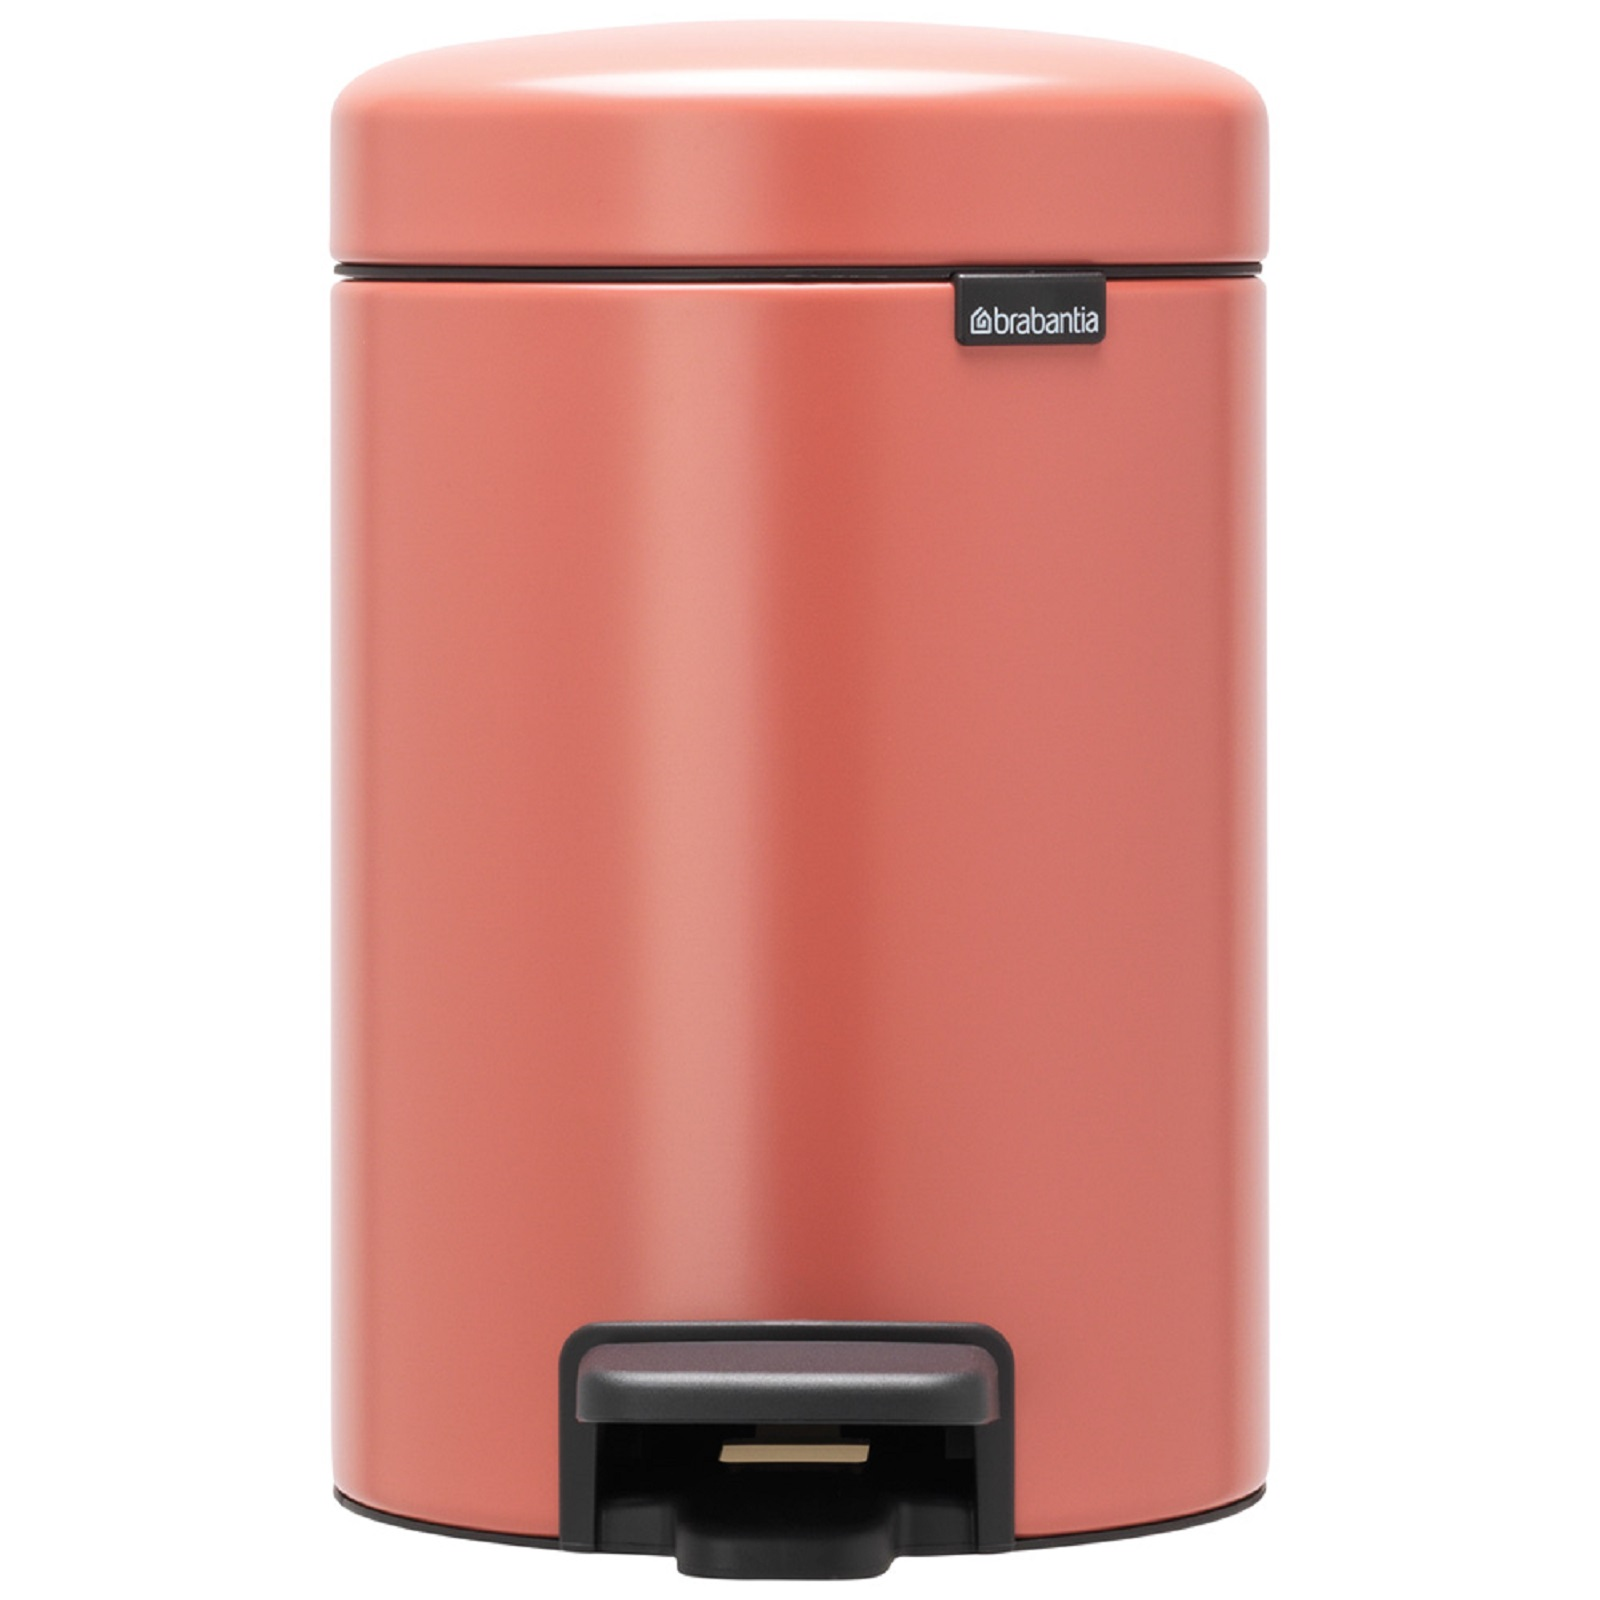 Онлайн каталог PROMENU: Бак для мусора Pedal Bin NewIcon Brabantia, объем 3 л, темно-оранжевый  304286